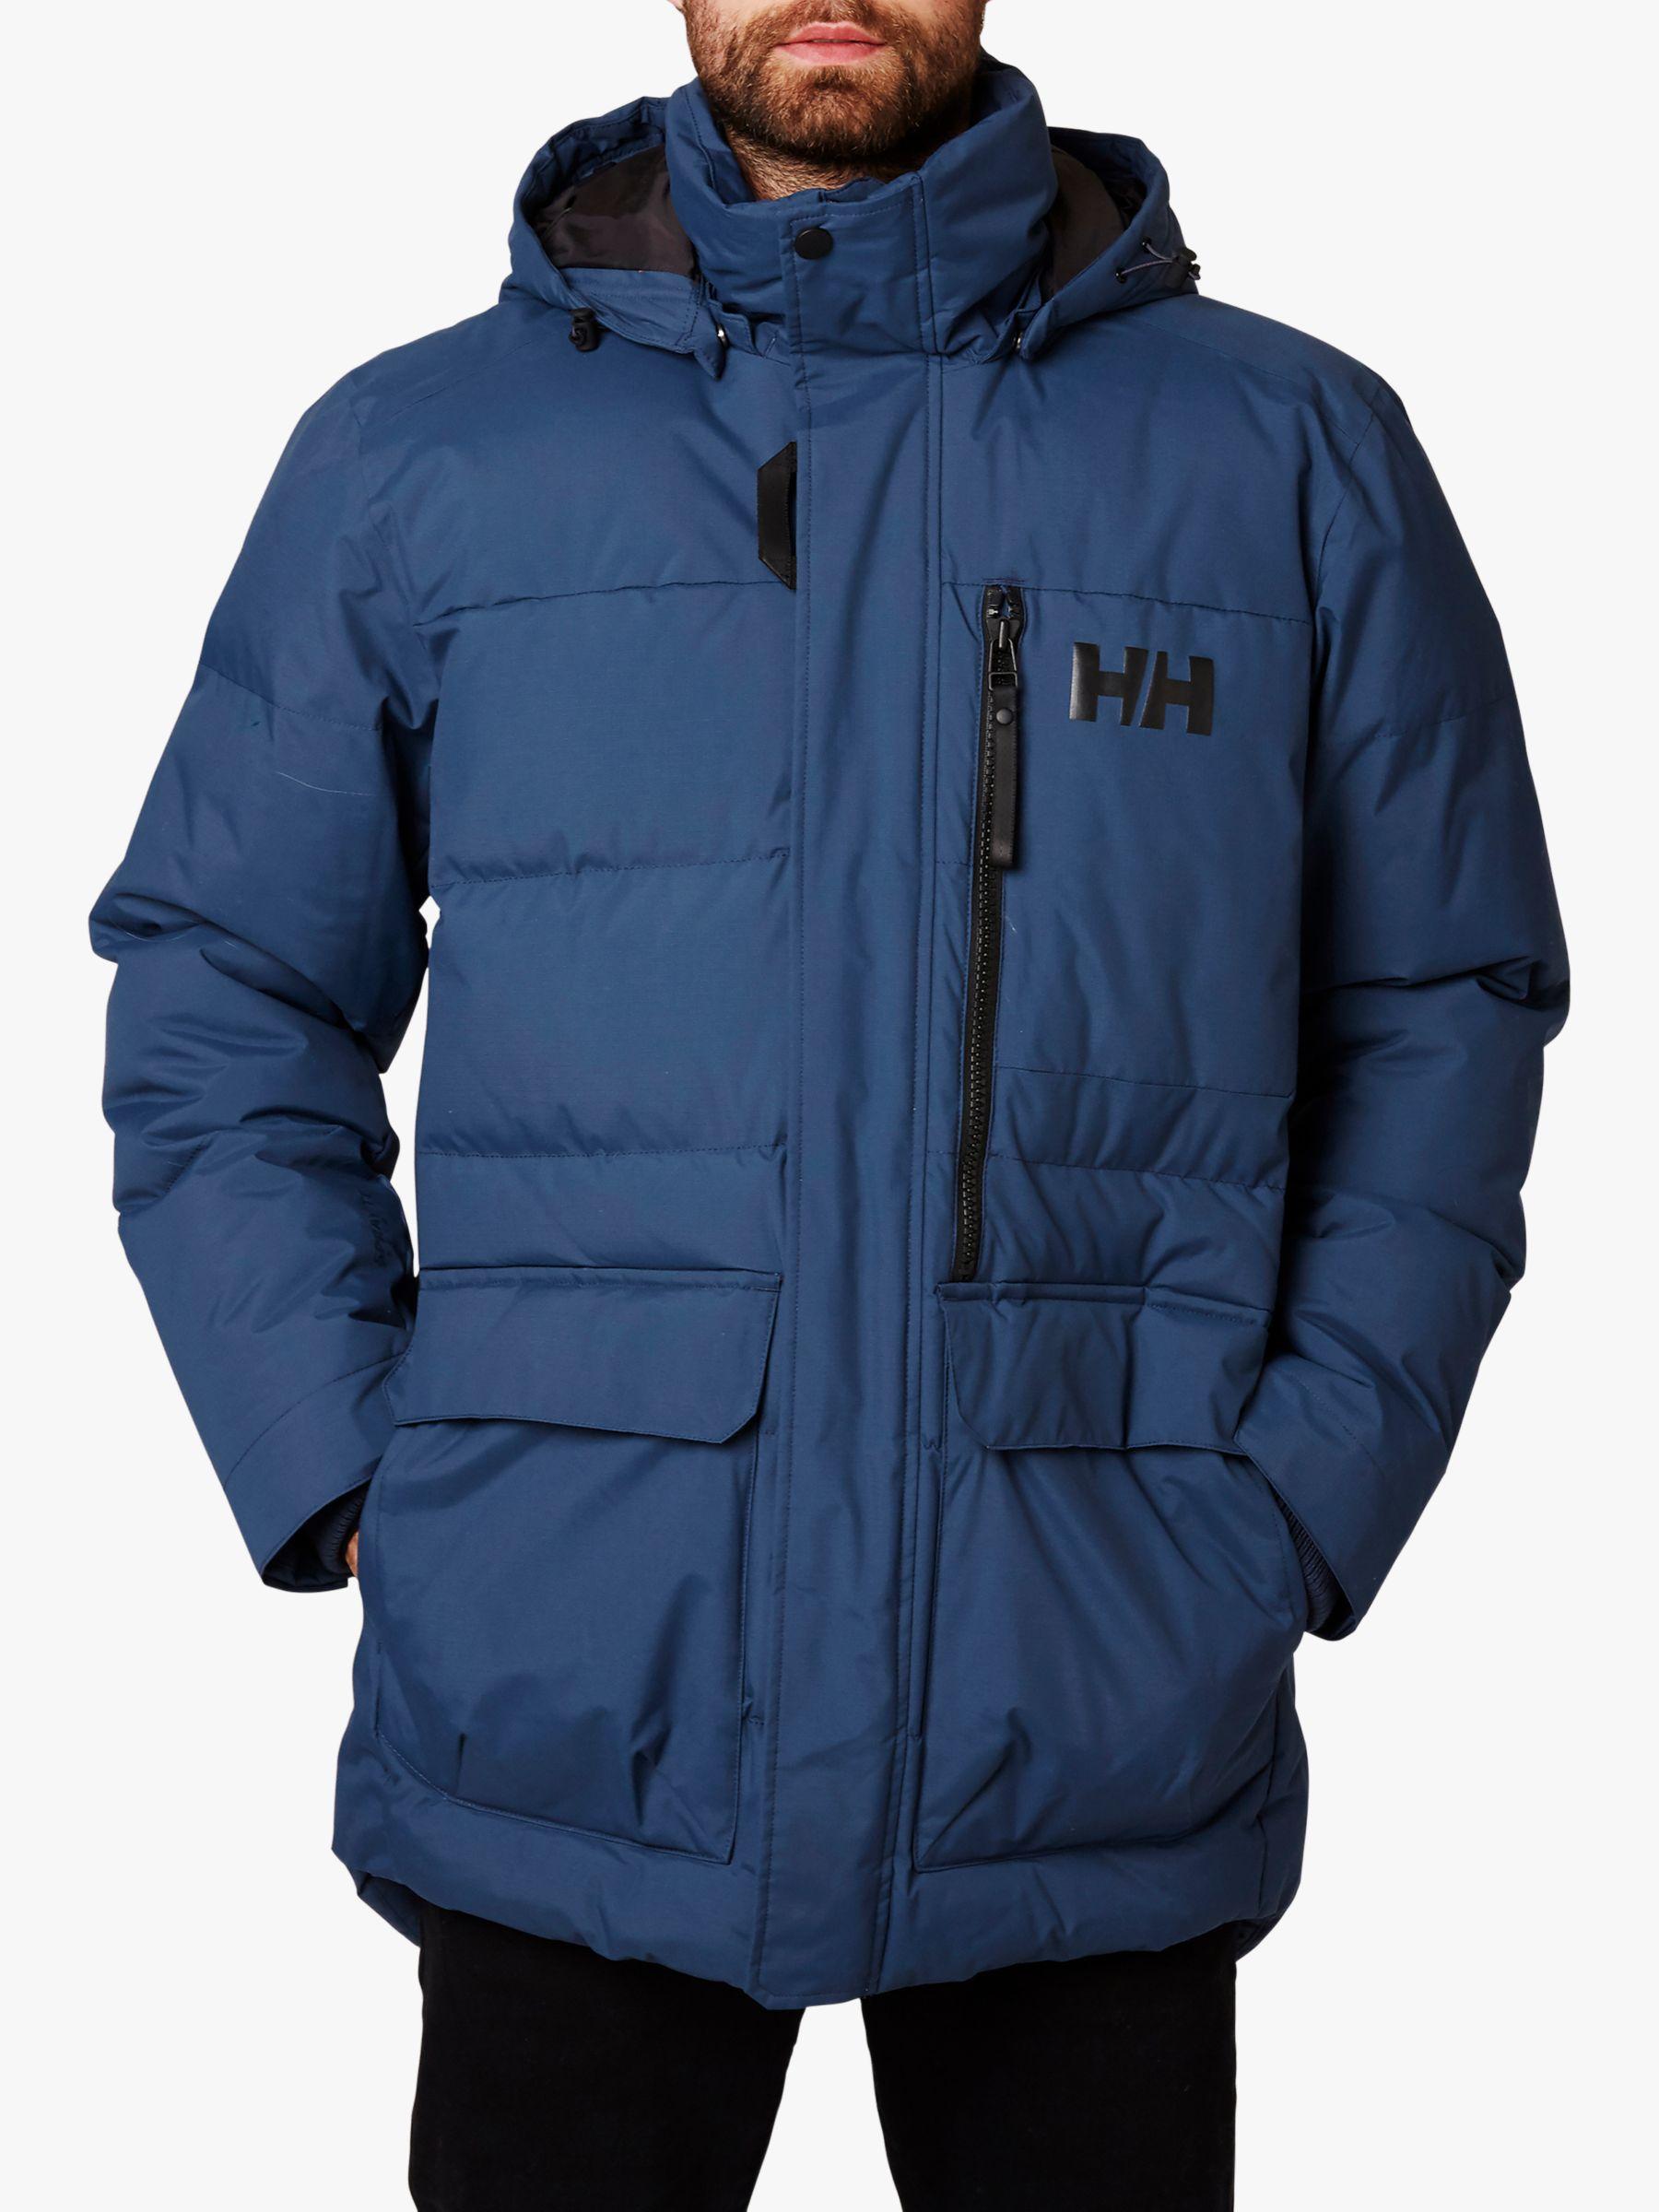 Helly Hansen Helly Hansen Tromsoe Men's Waterproof Jacket, Navy